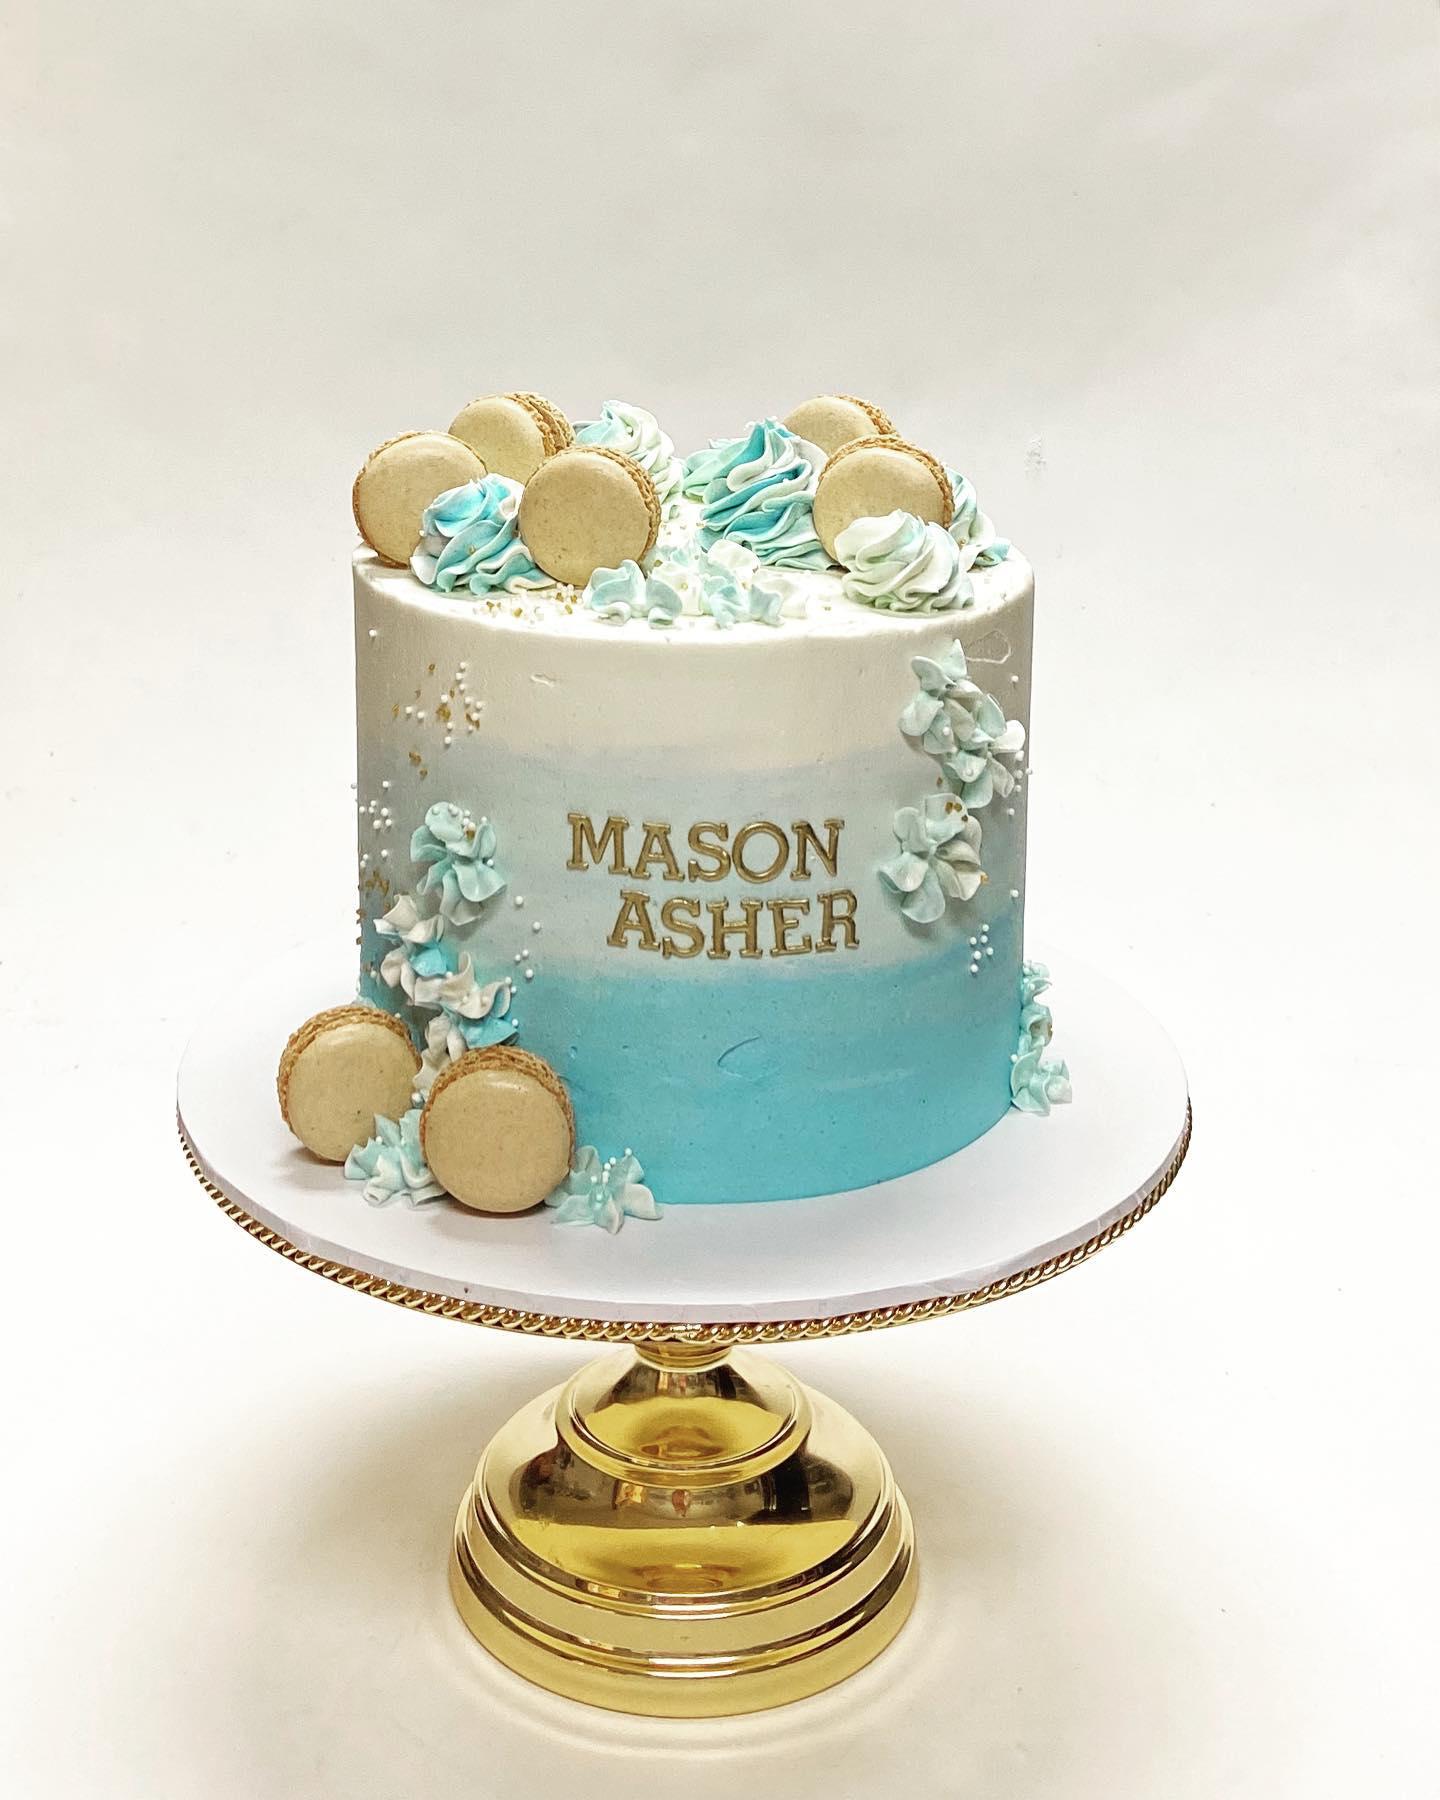 masonasher